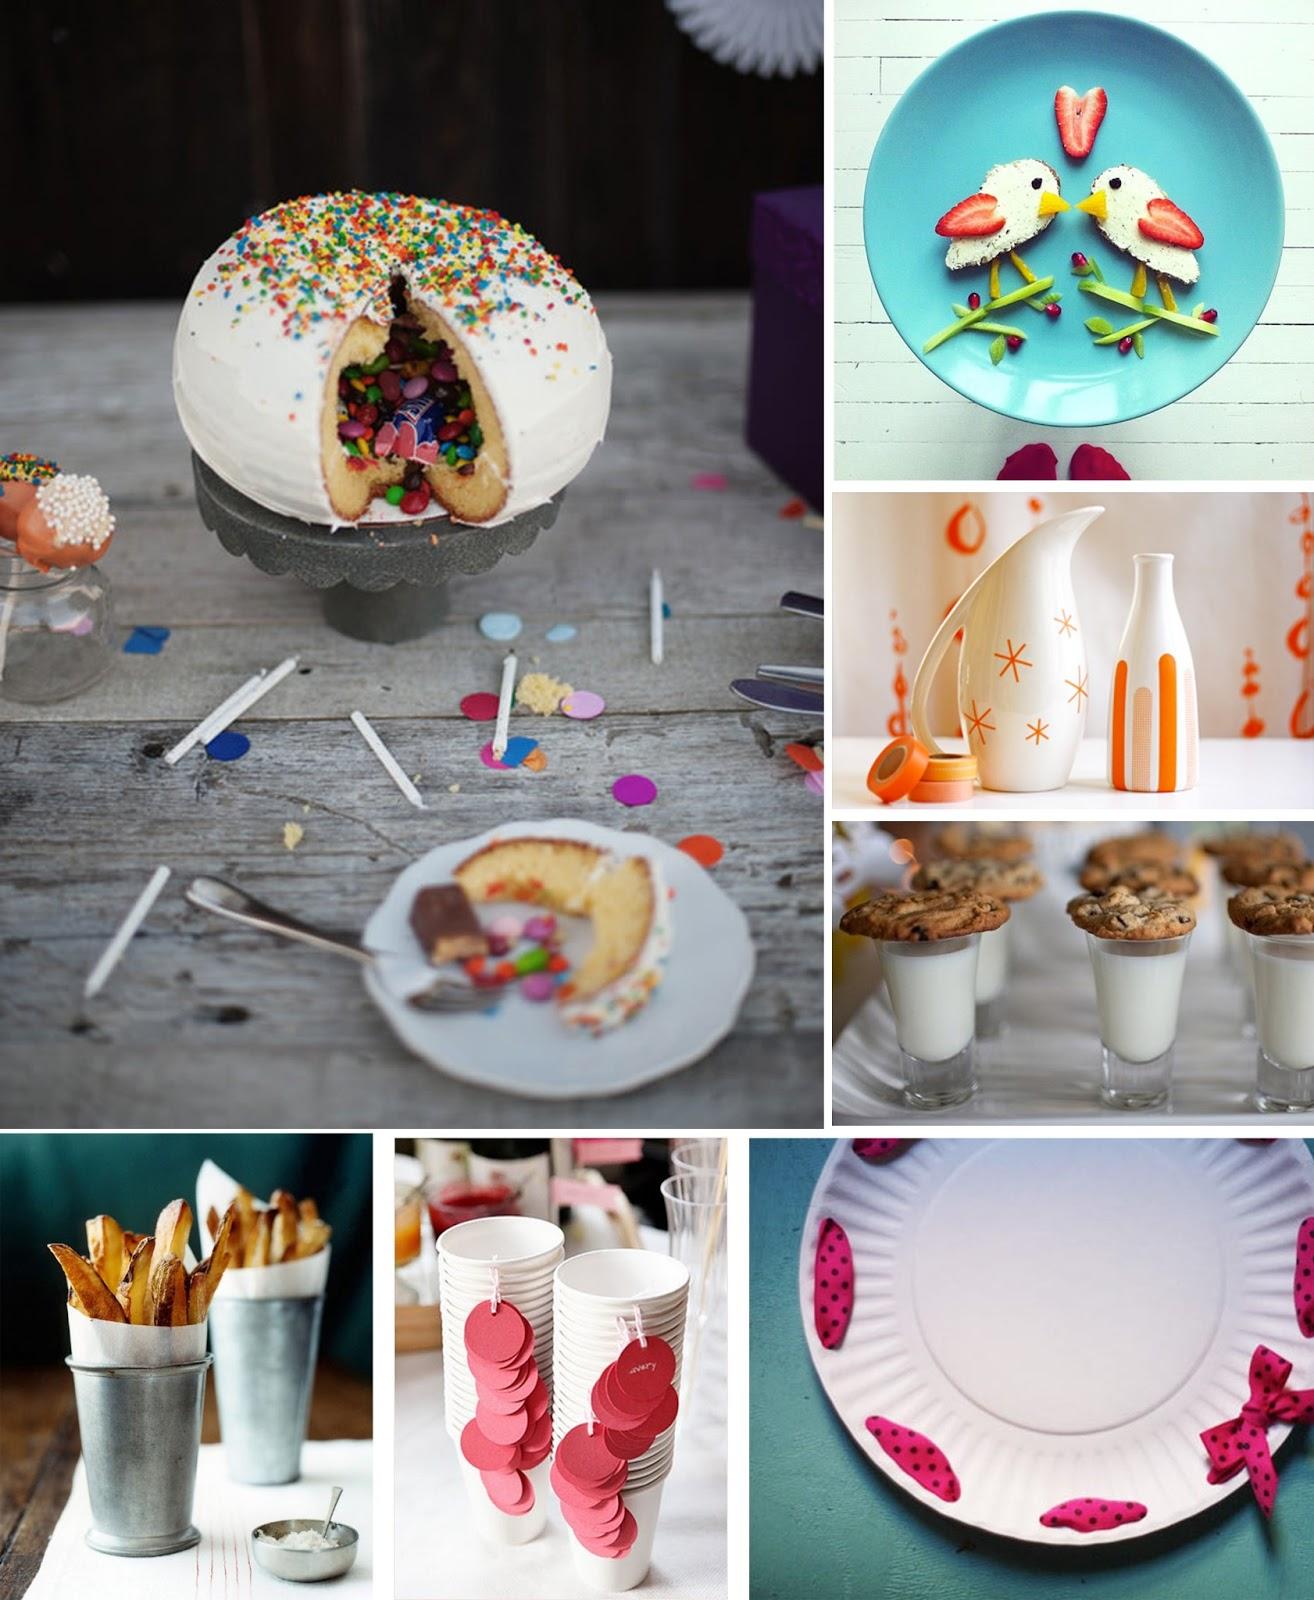 Ideas para una fiesta. HomePersonalShopper, buffet, tarta, guirnaldas, cumpleaños, niños, niña, infantil, washi tape